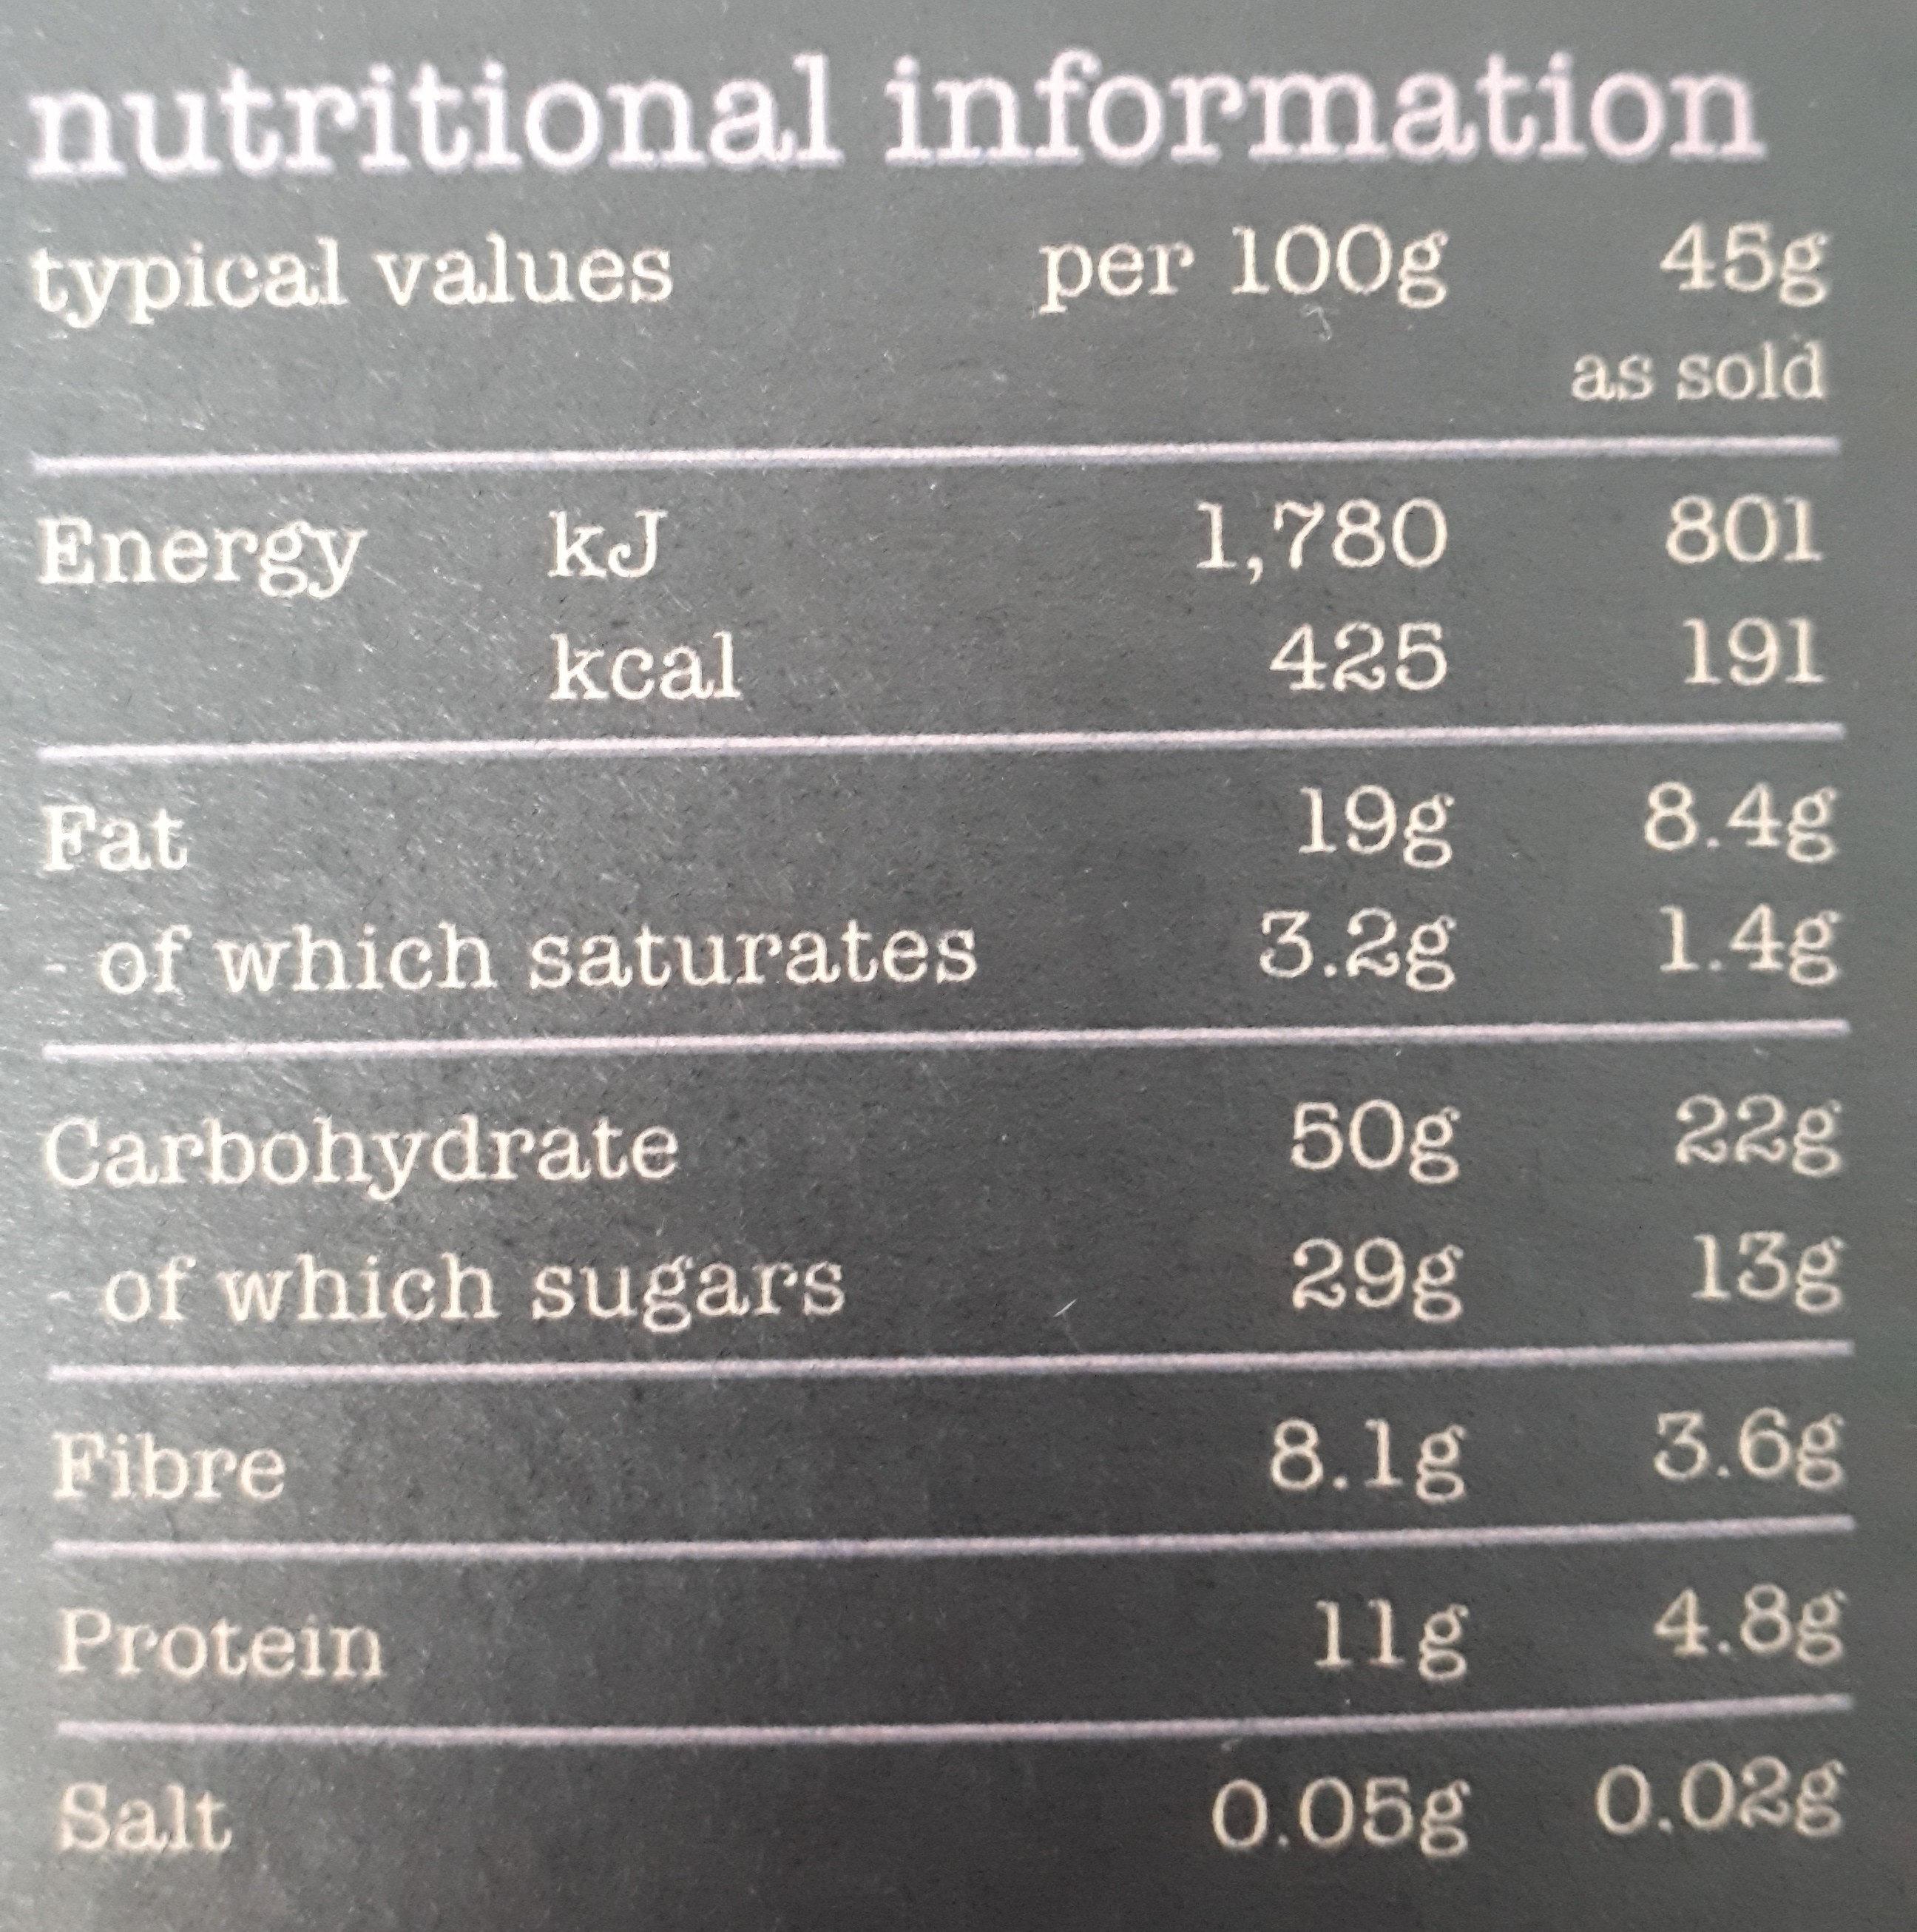 Fruity muesli - Nutrition facts